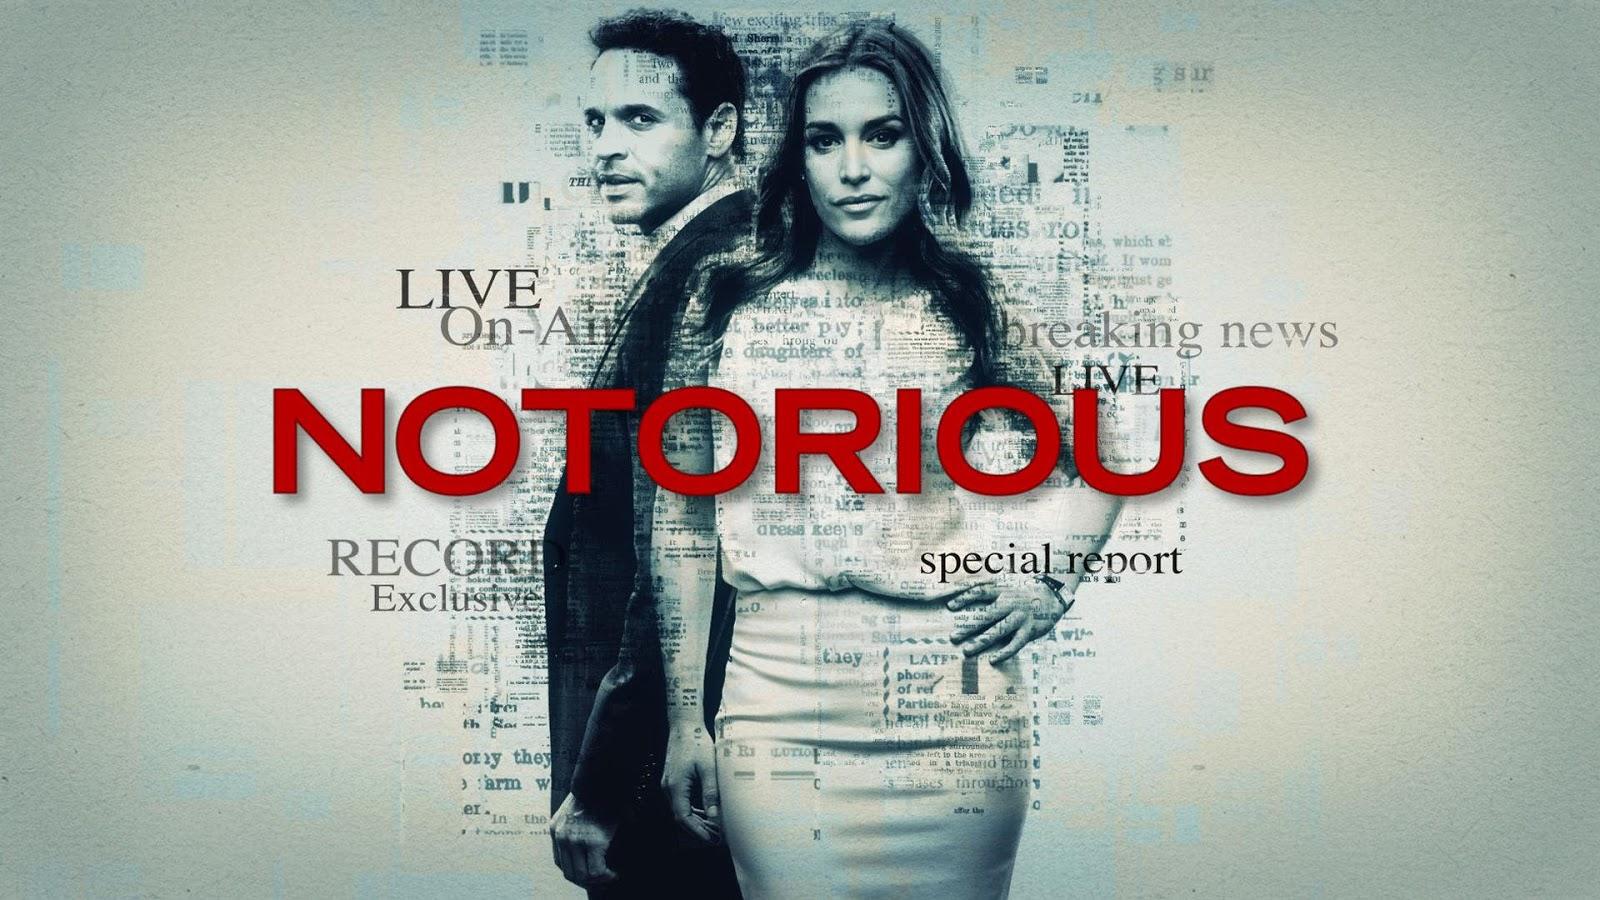 notorious-abc-estrenos-2016-piper-perabo-daniel-sunjata